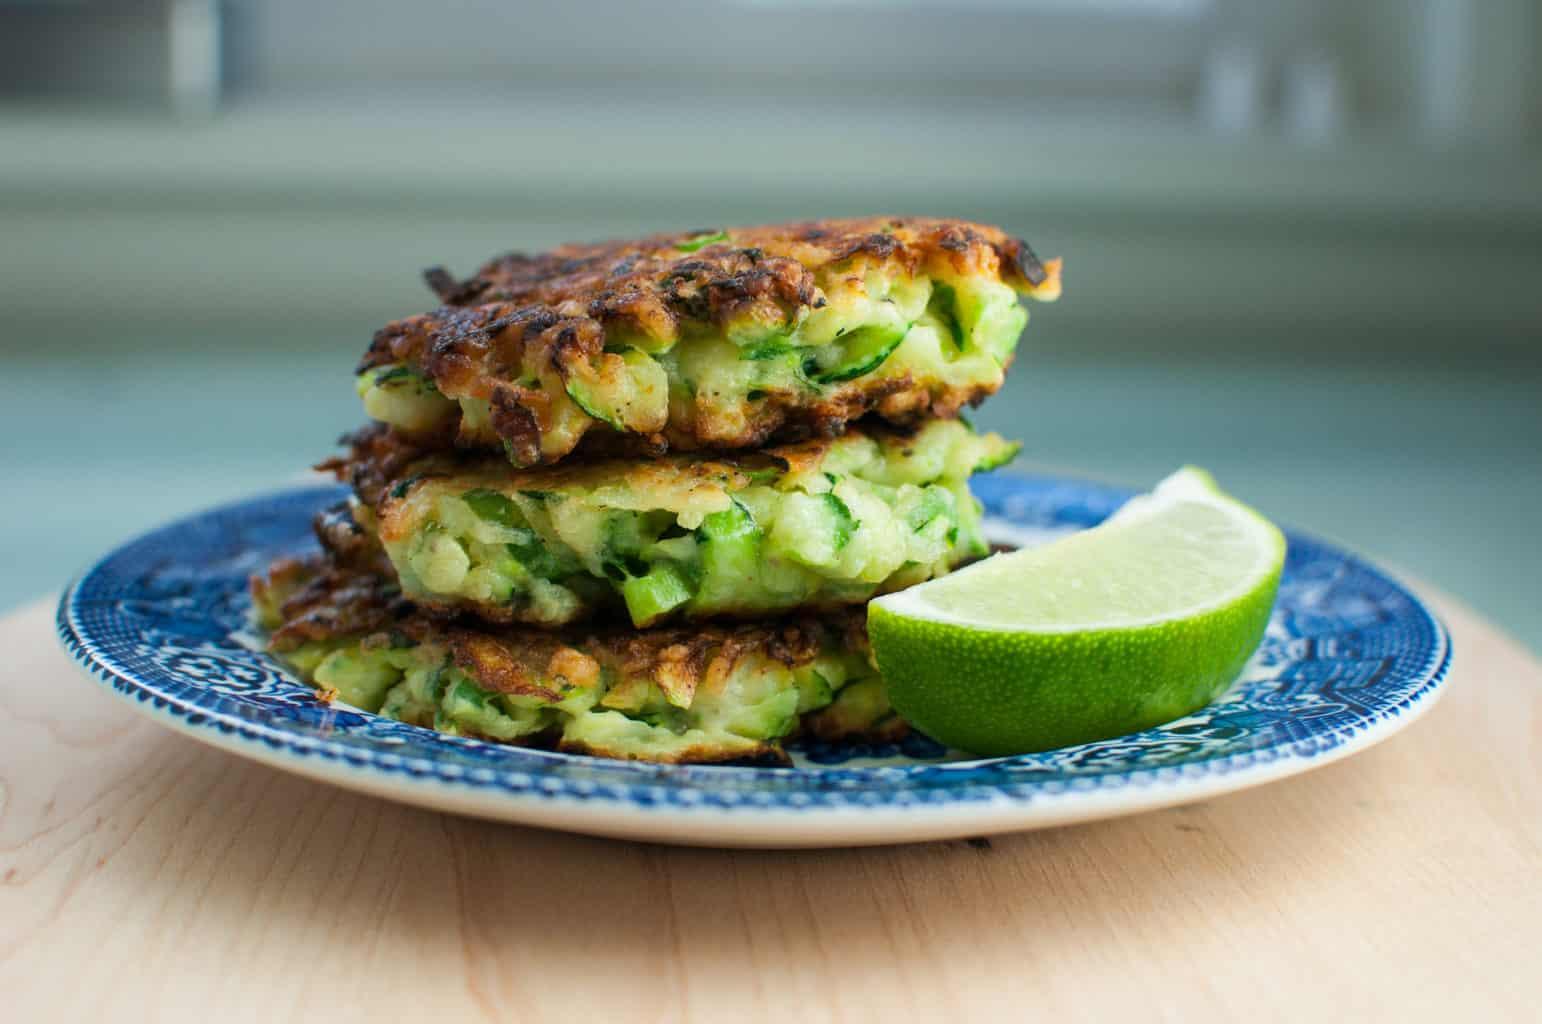 The Awesome Mitten - 3 New Ways to Enjoy This Season's Zucchini Abundance